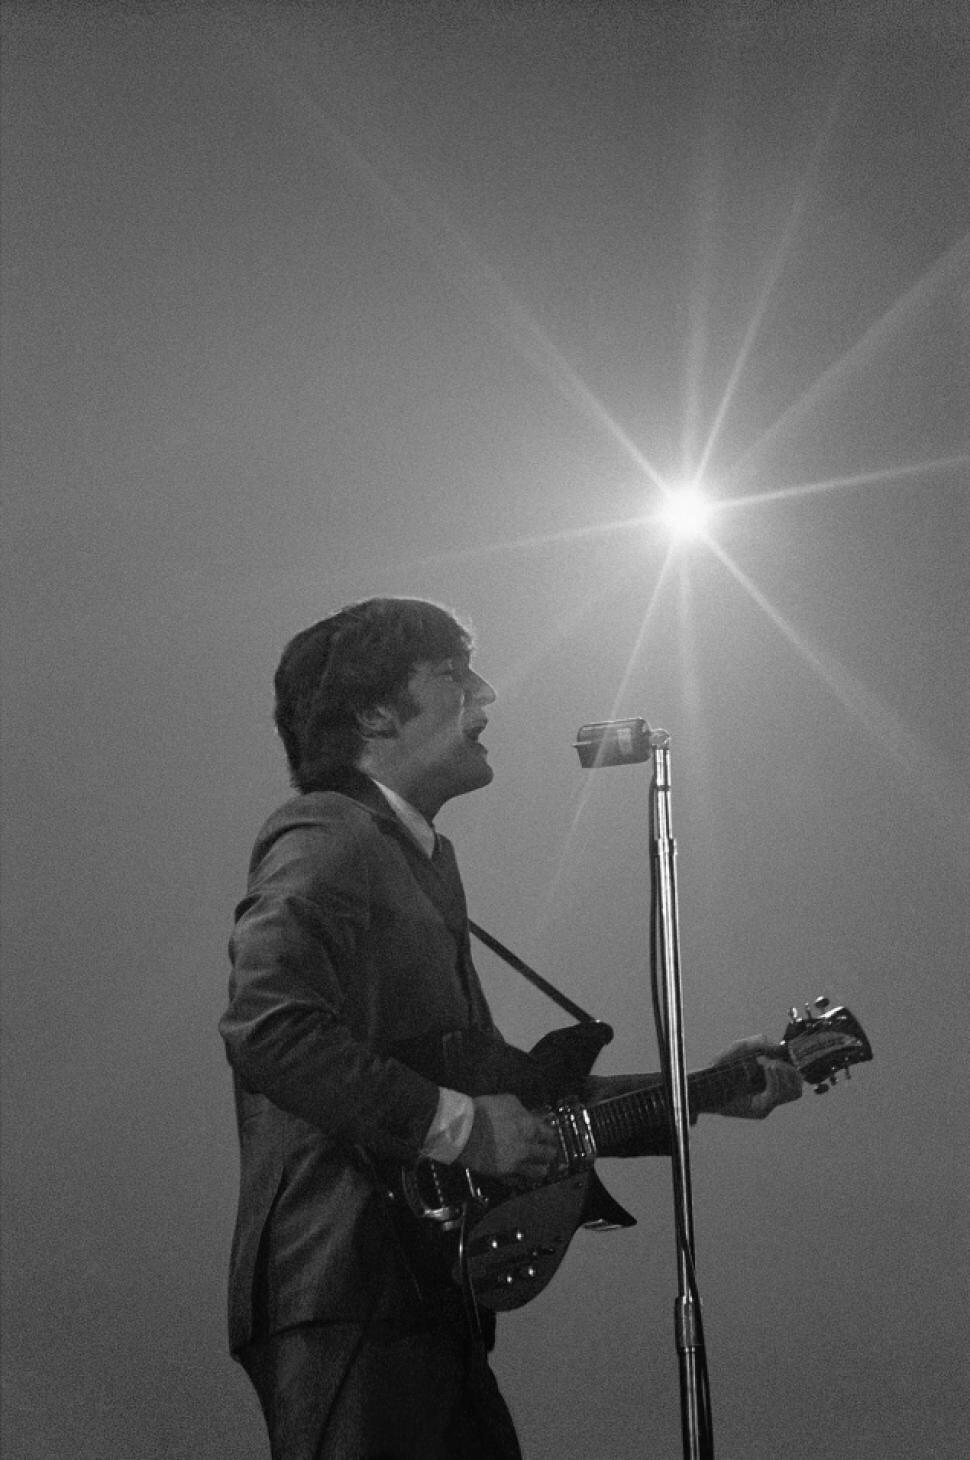 John Lennon at the Washington Coliseum, February 11th 1964.